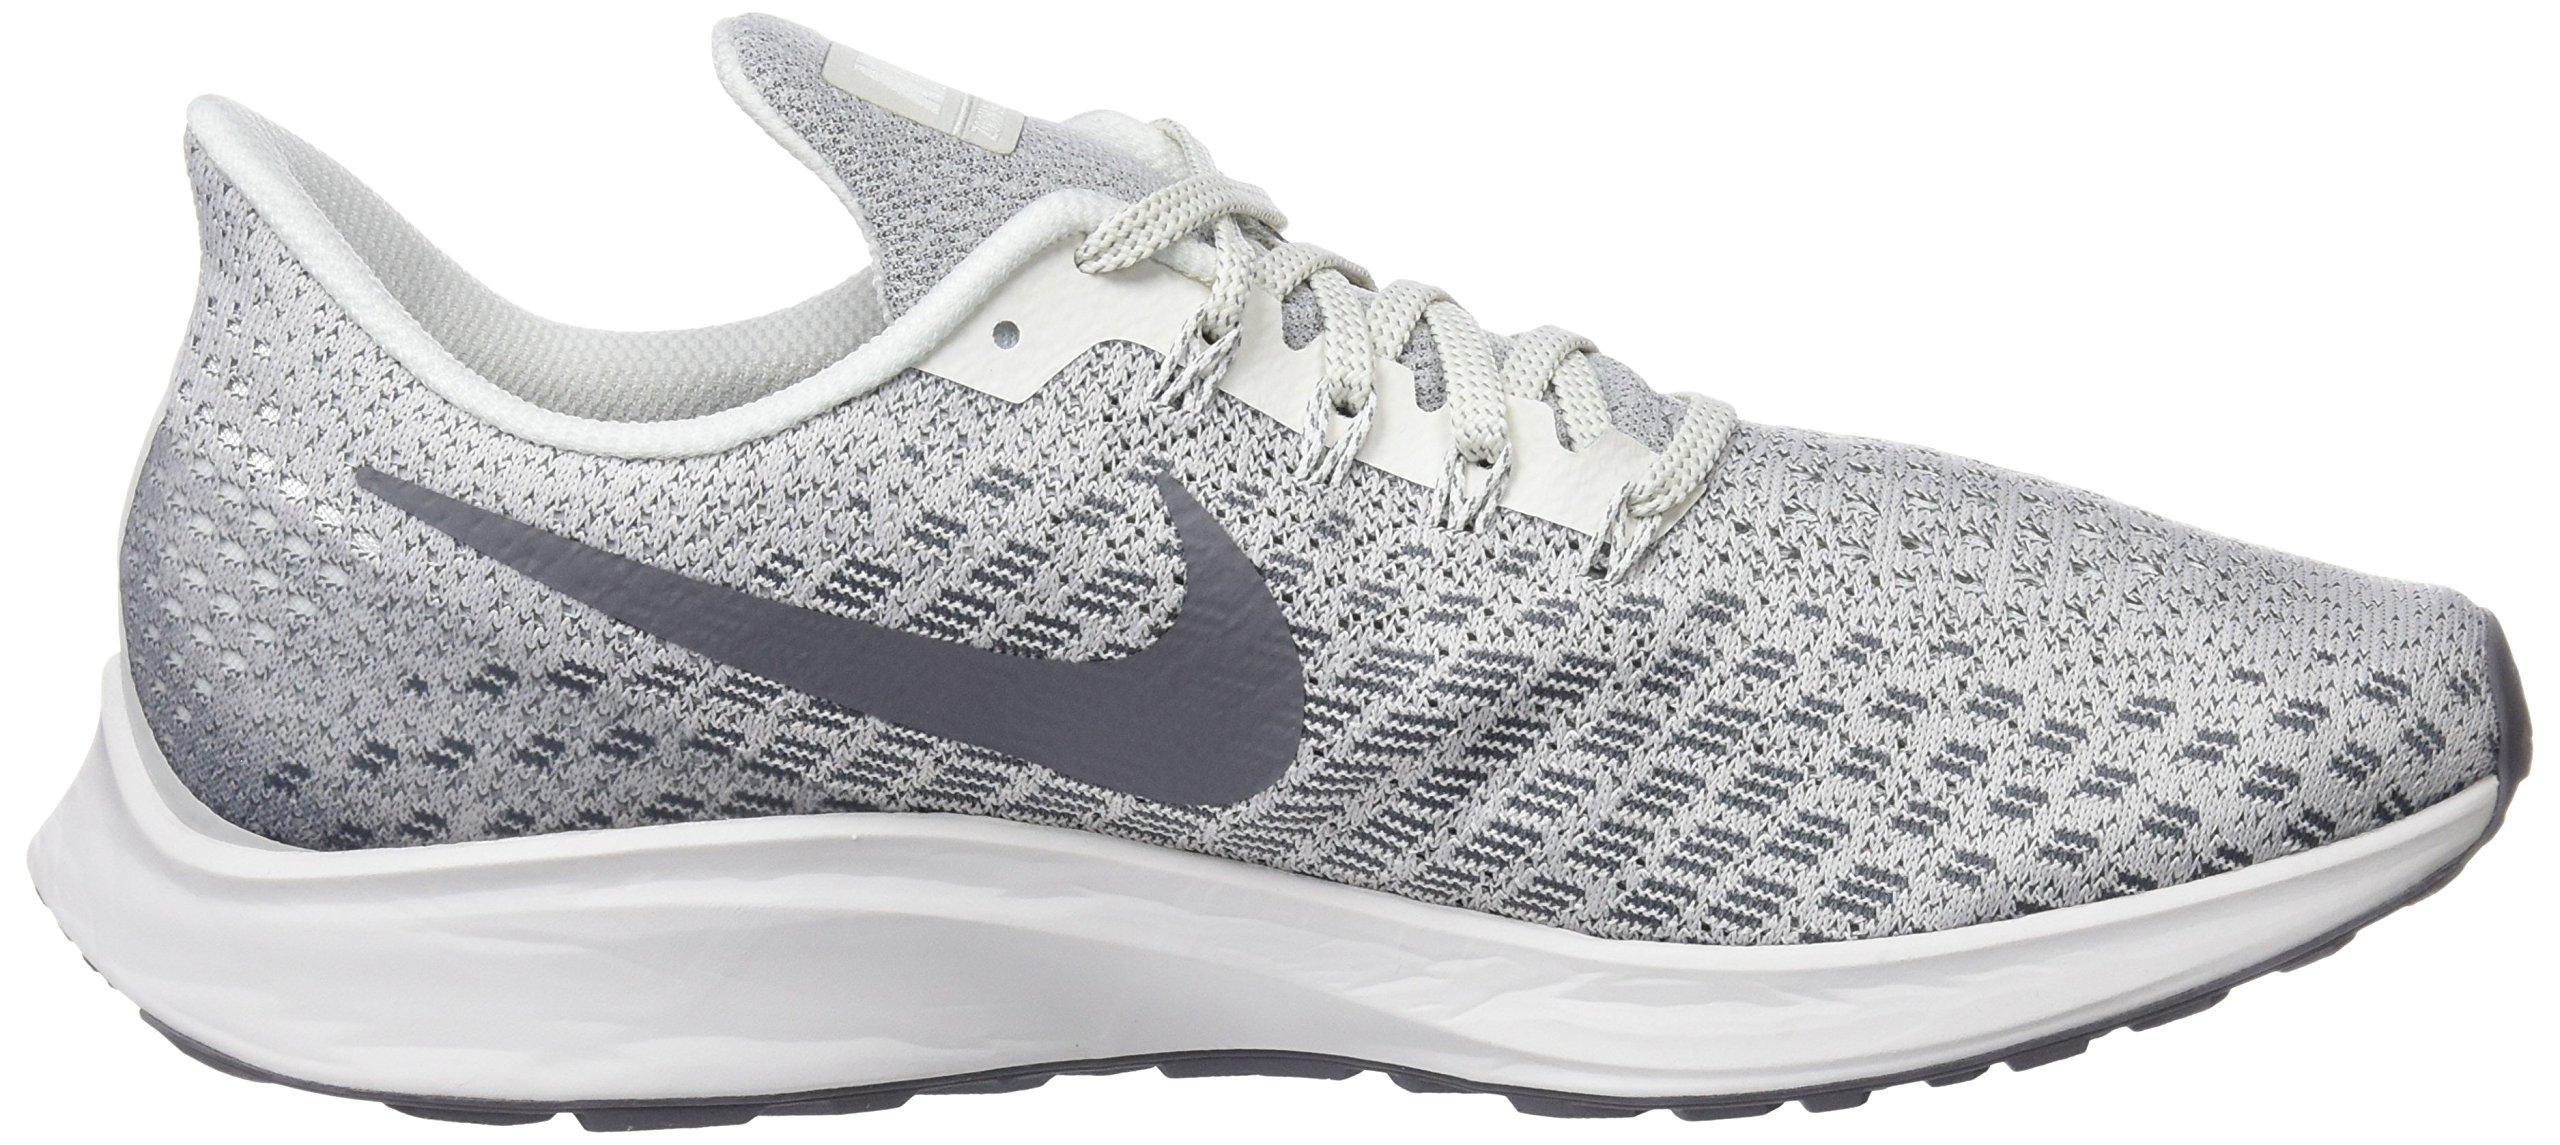 Nike Air Zoom Pegasus 35 Mens 942851-004 Size 6.5 by Nike (Image #6)